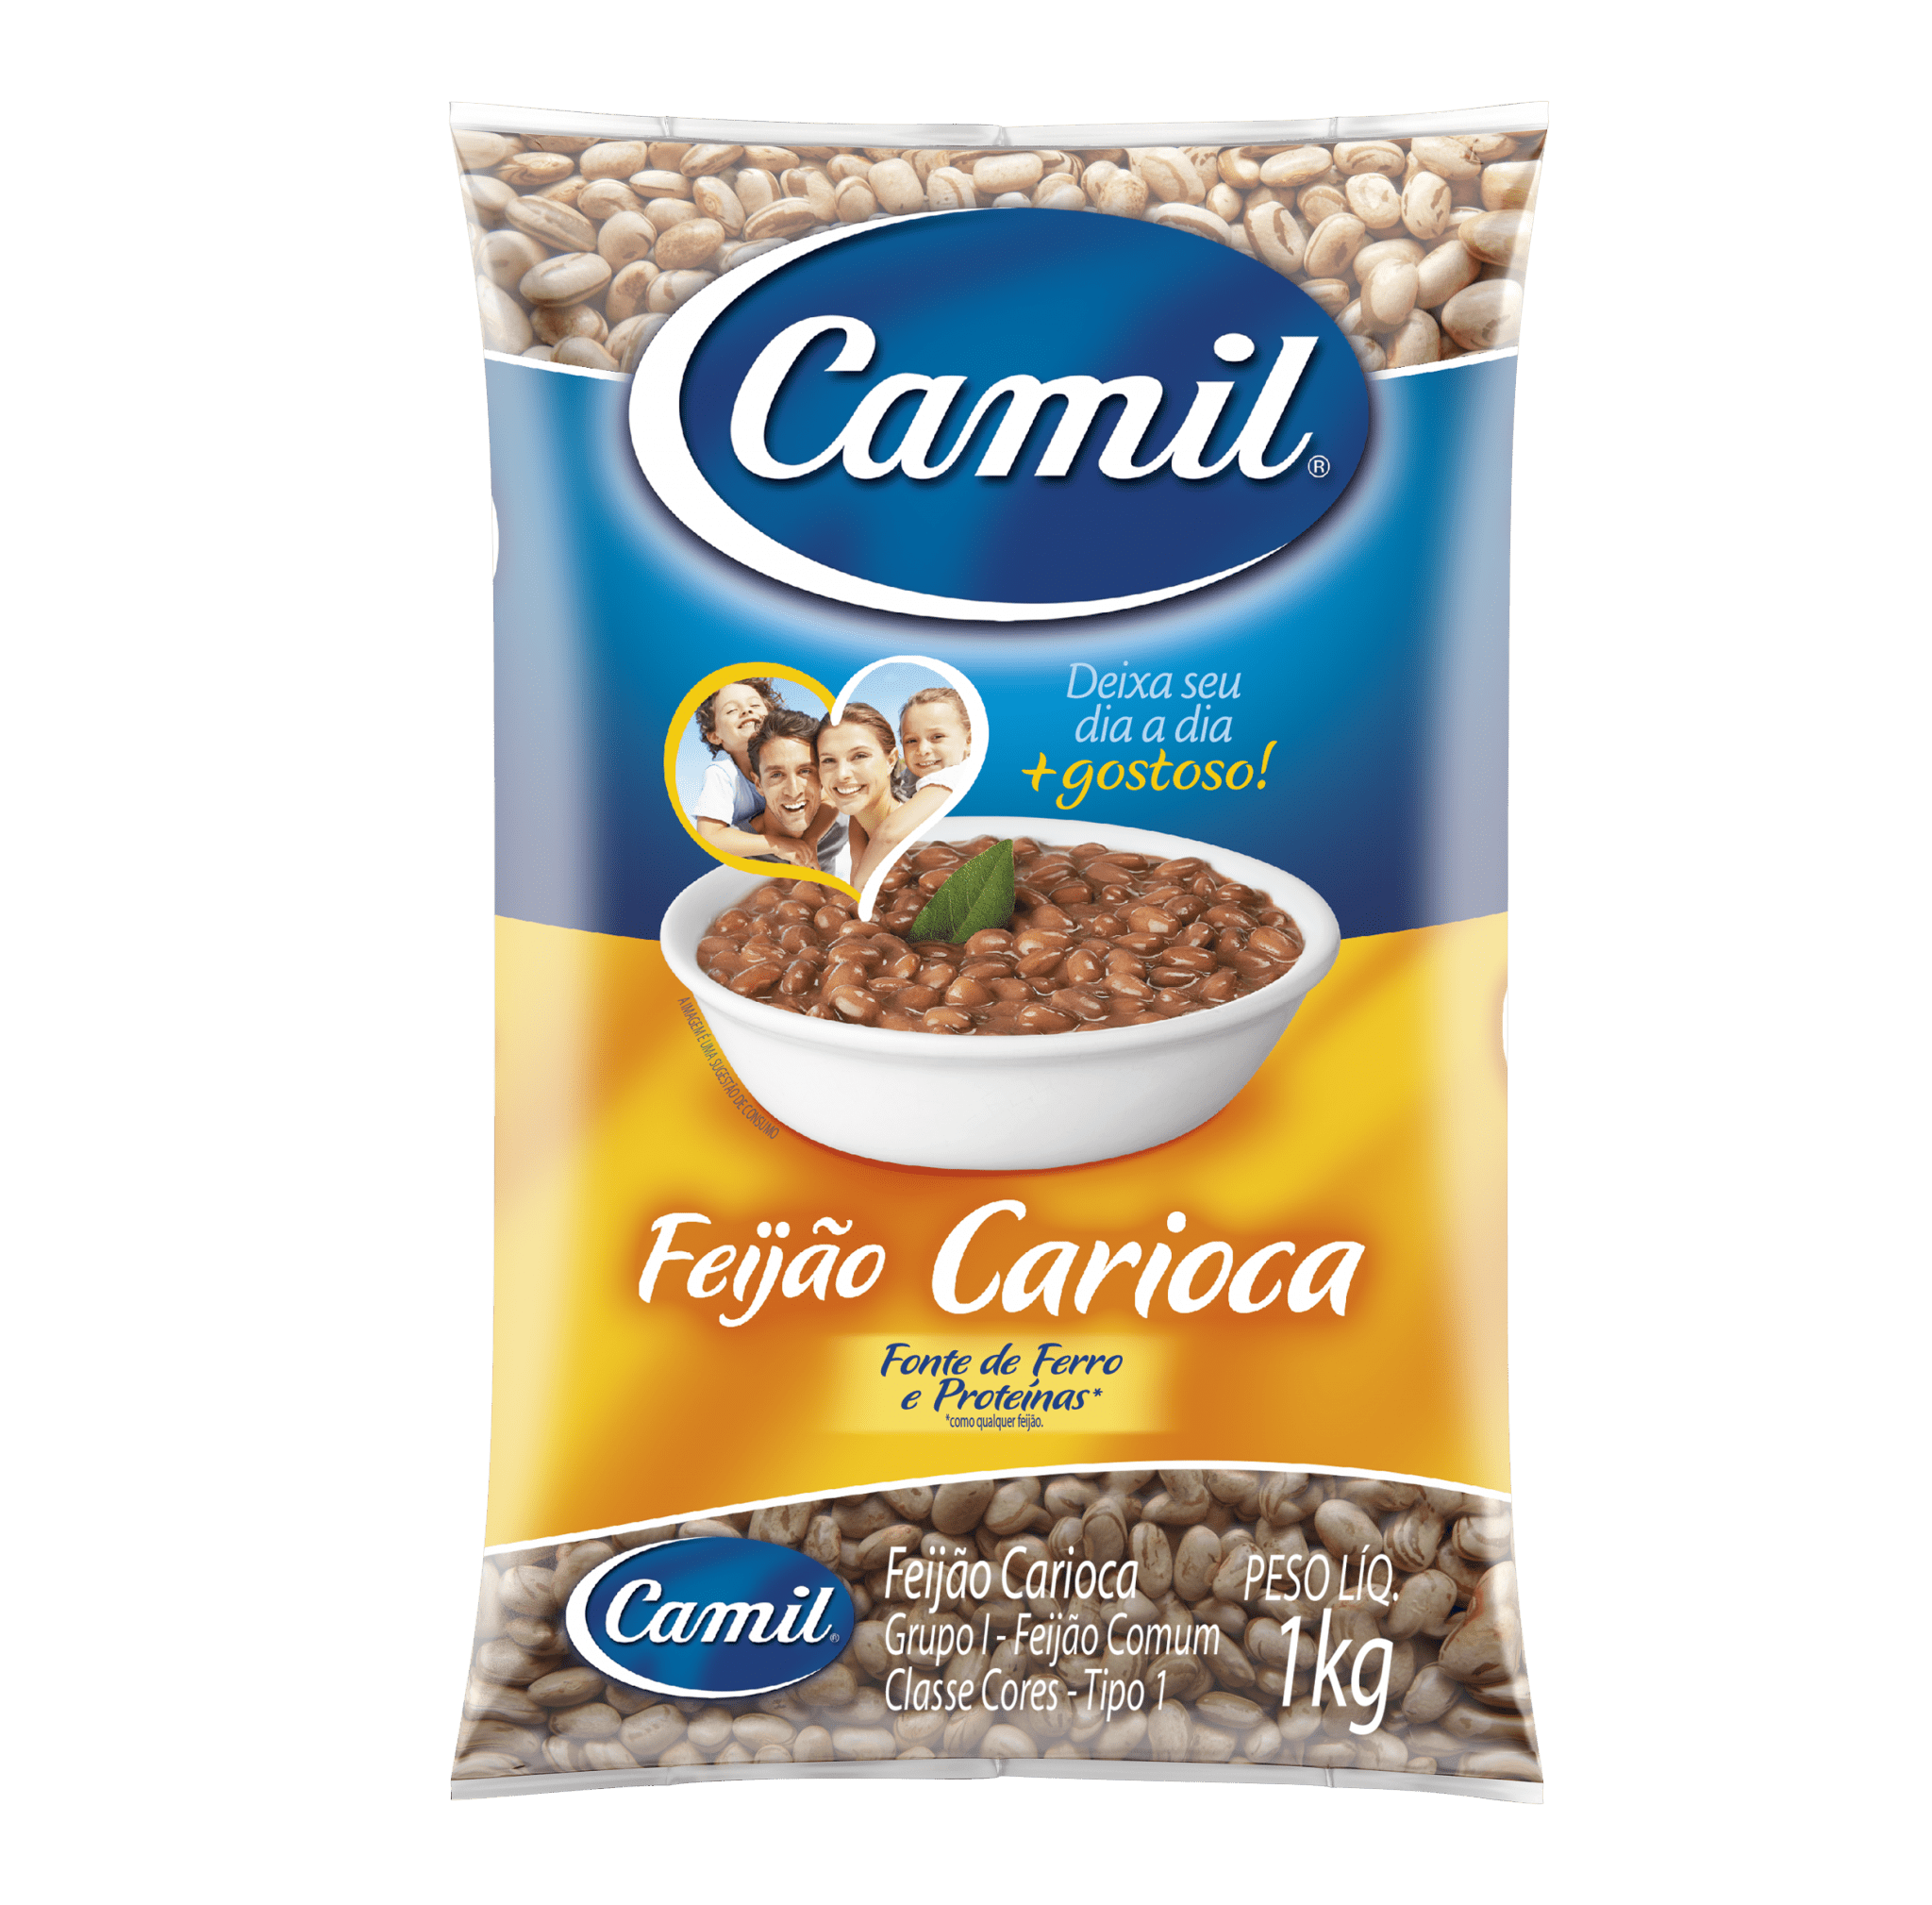 Camil Pinto Beans (10 x 1kg).